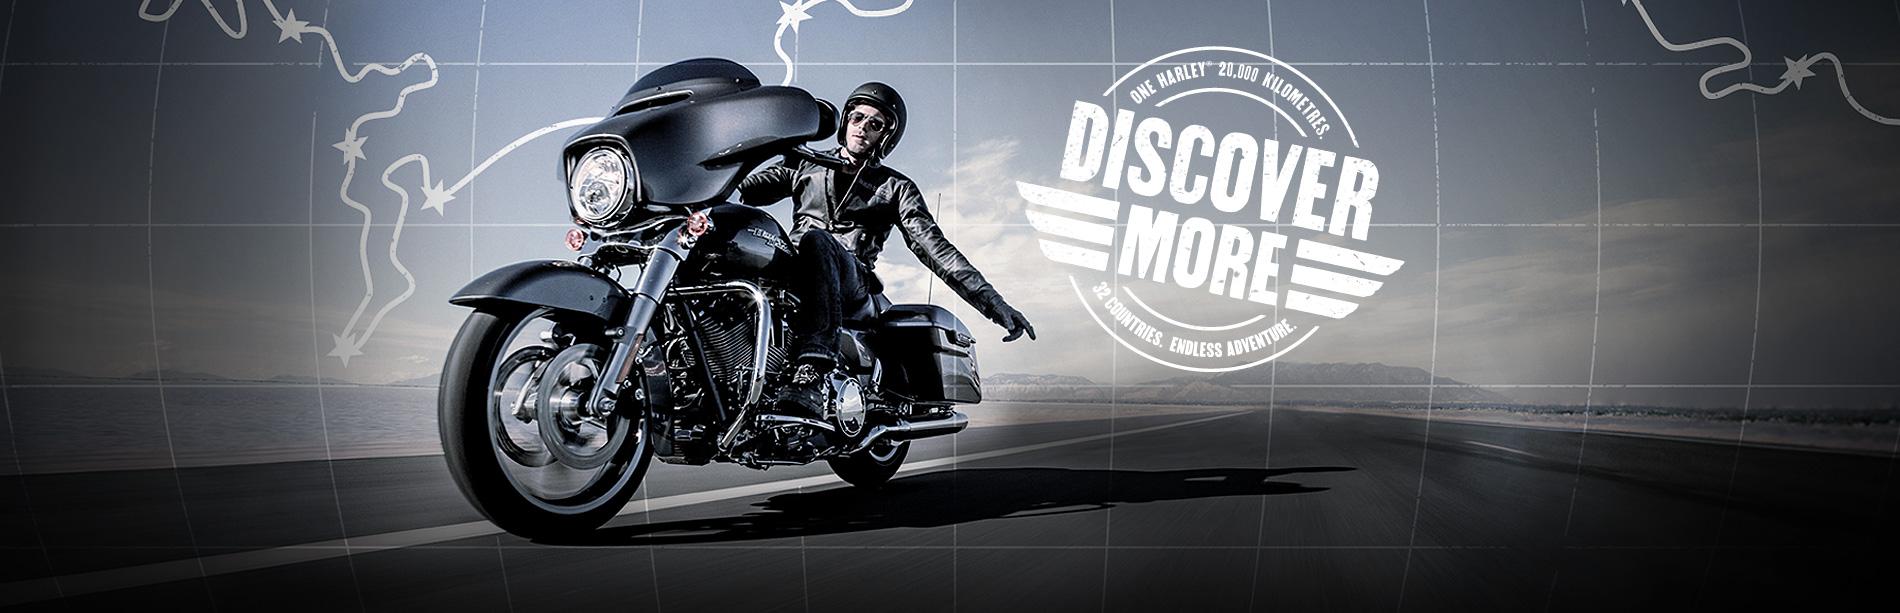 Harley-Davidson-Discover-more-David-tribal